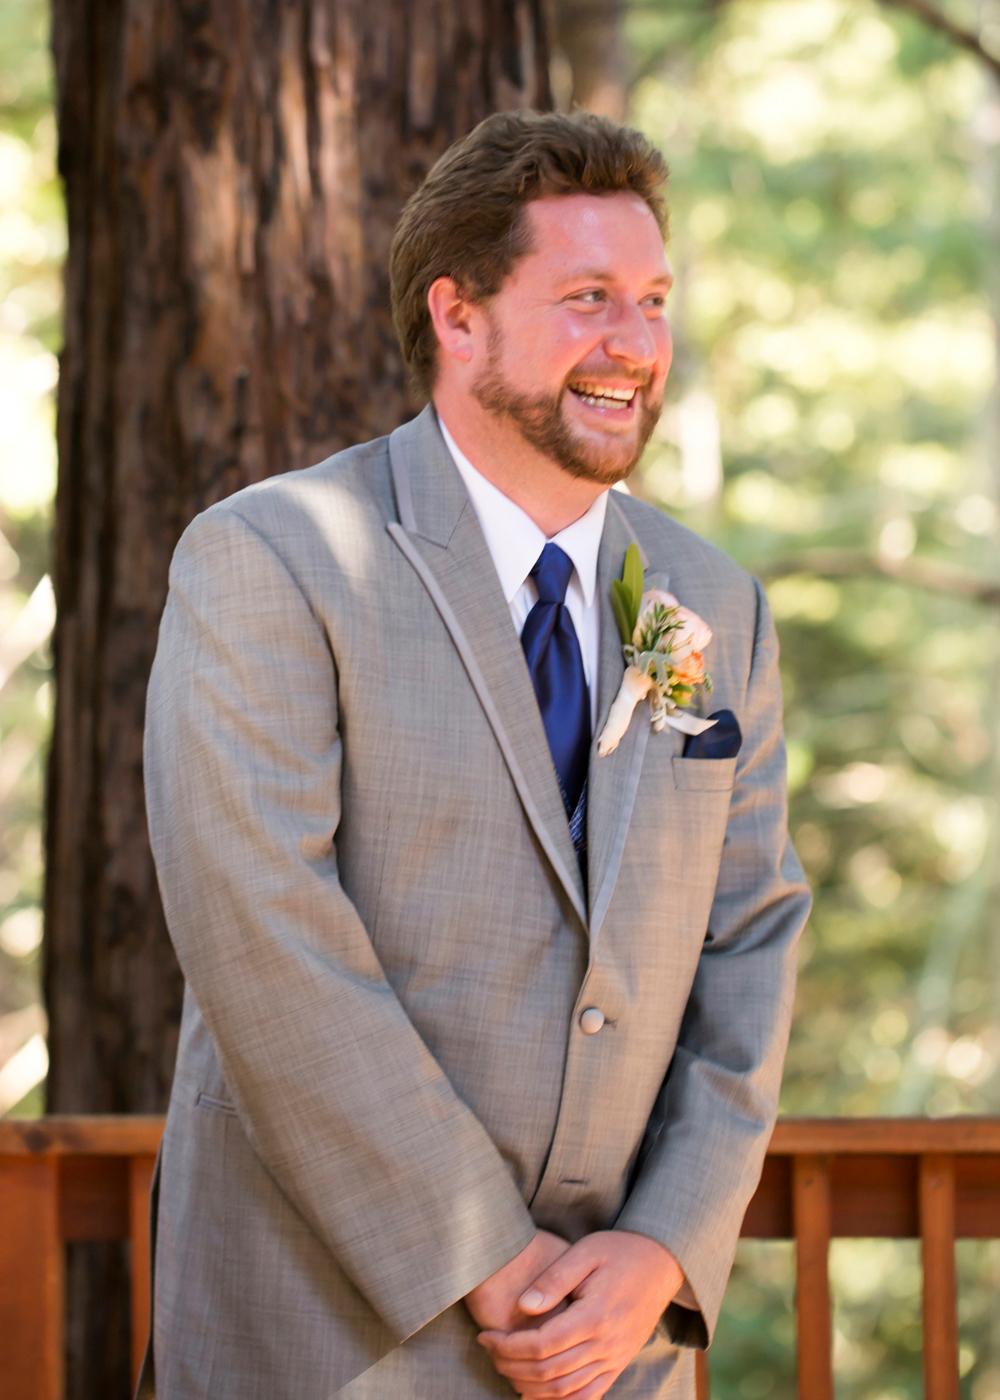 pema-osel-ling-santa-cruz-wedding-photography-lilouette-37.jpg